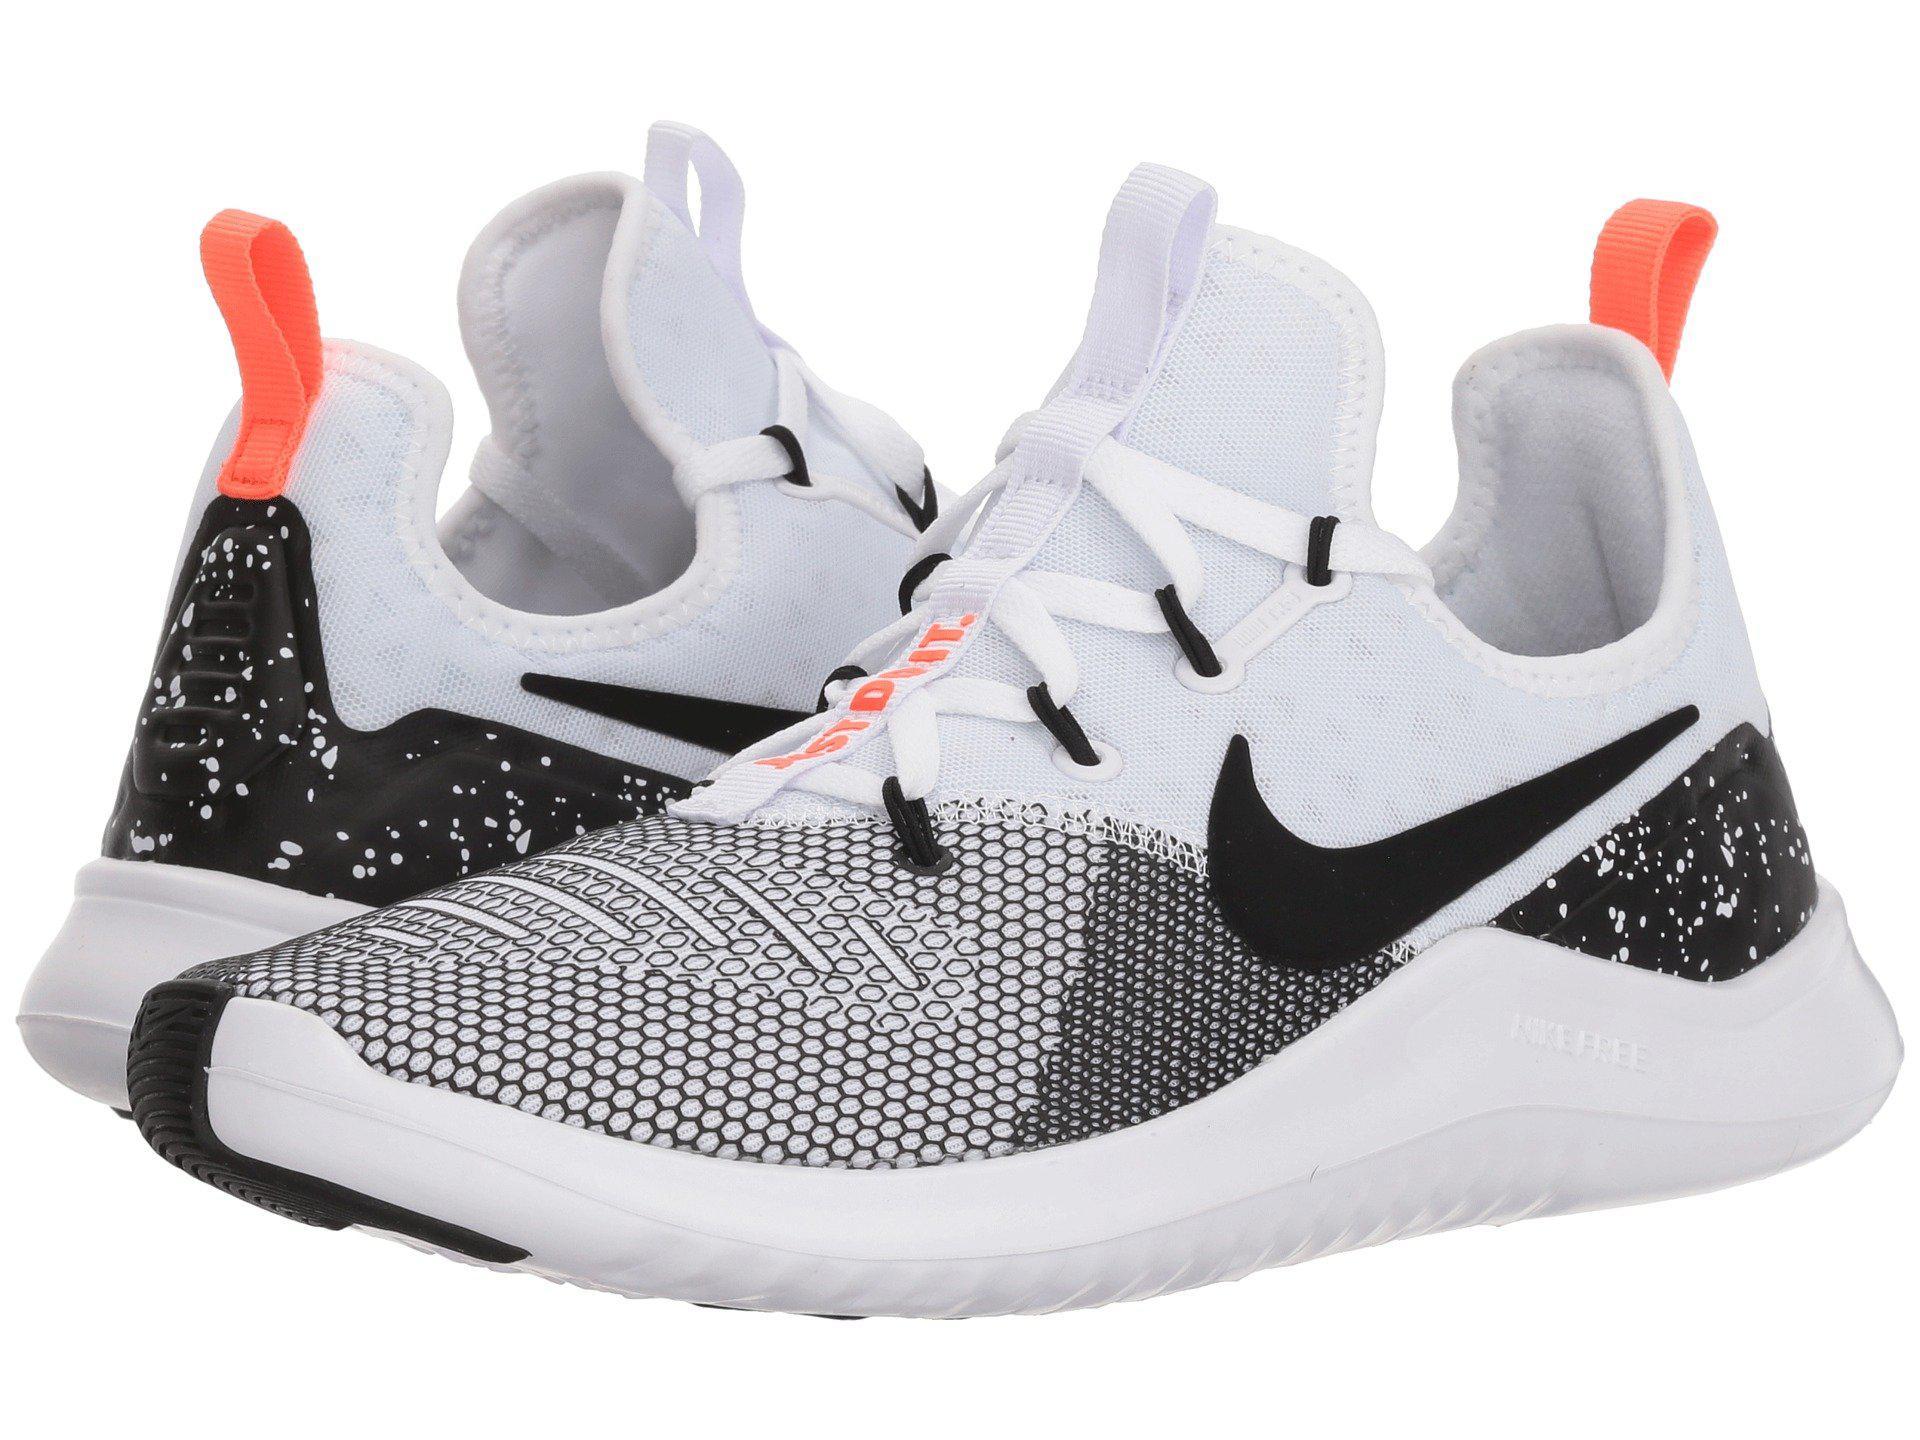 96aeb66874e11 Lyst - Nike Free Tr 8 (black white) Women s Cross Training Shoes in ...